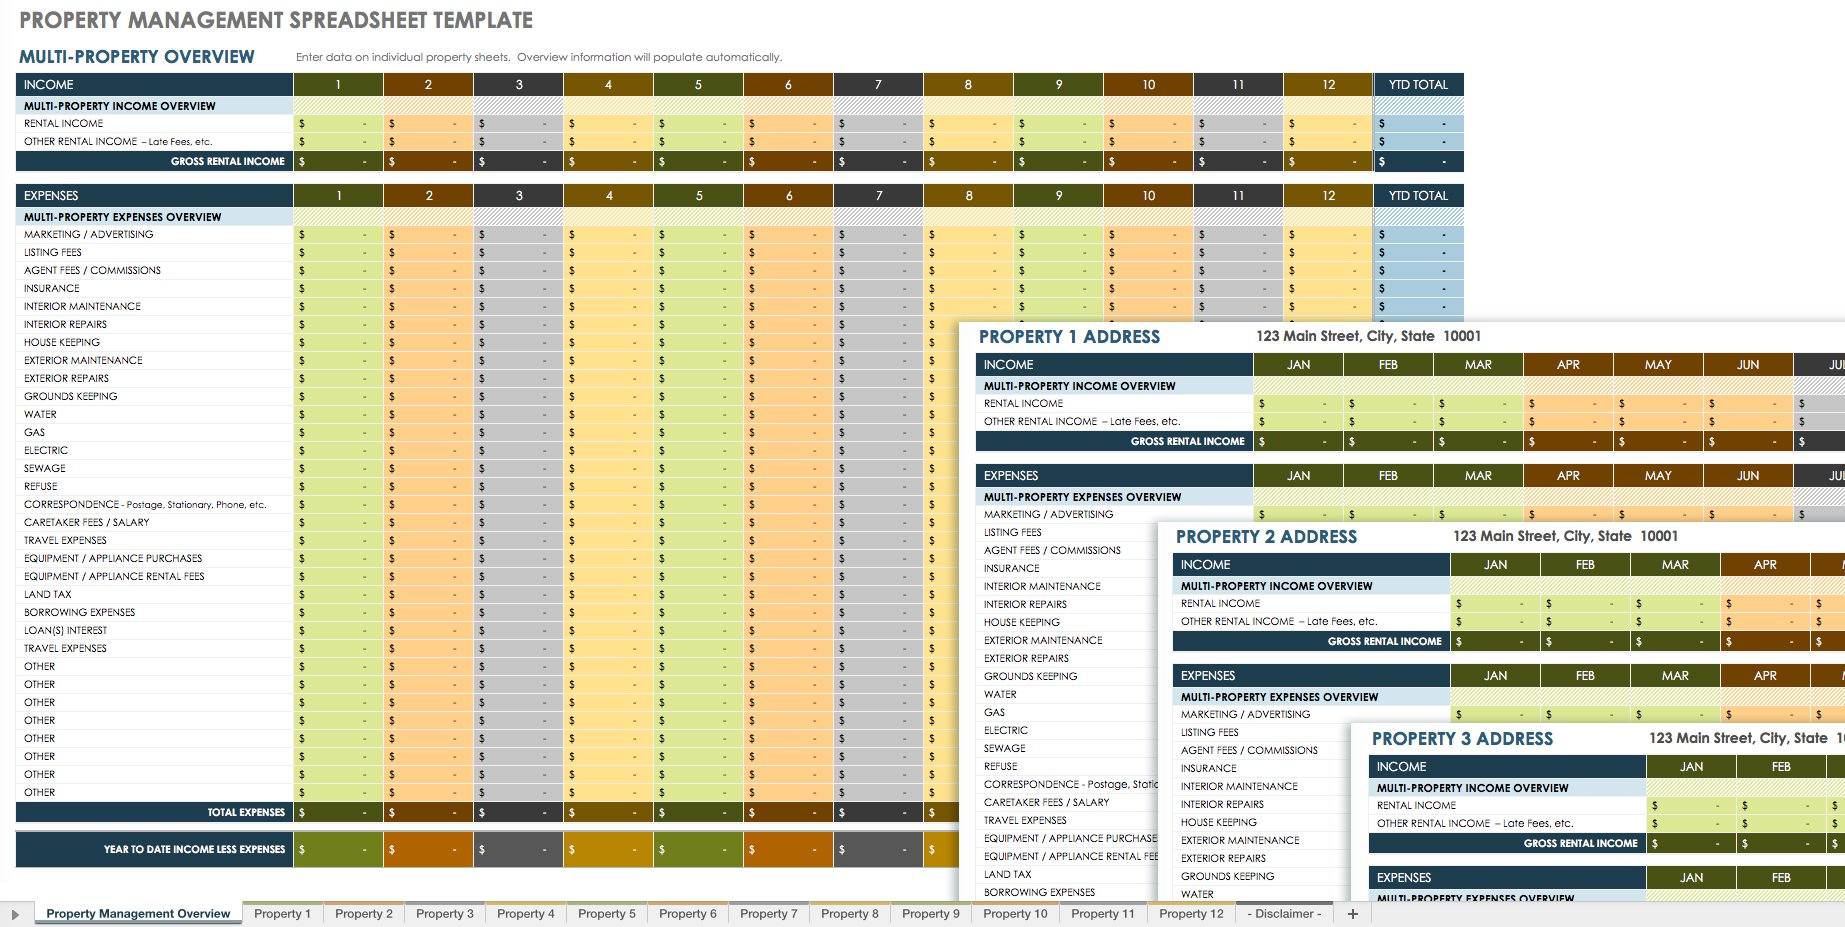 Printable Property Management Budget Template Excel In Property Management Budget Template Excel Sample